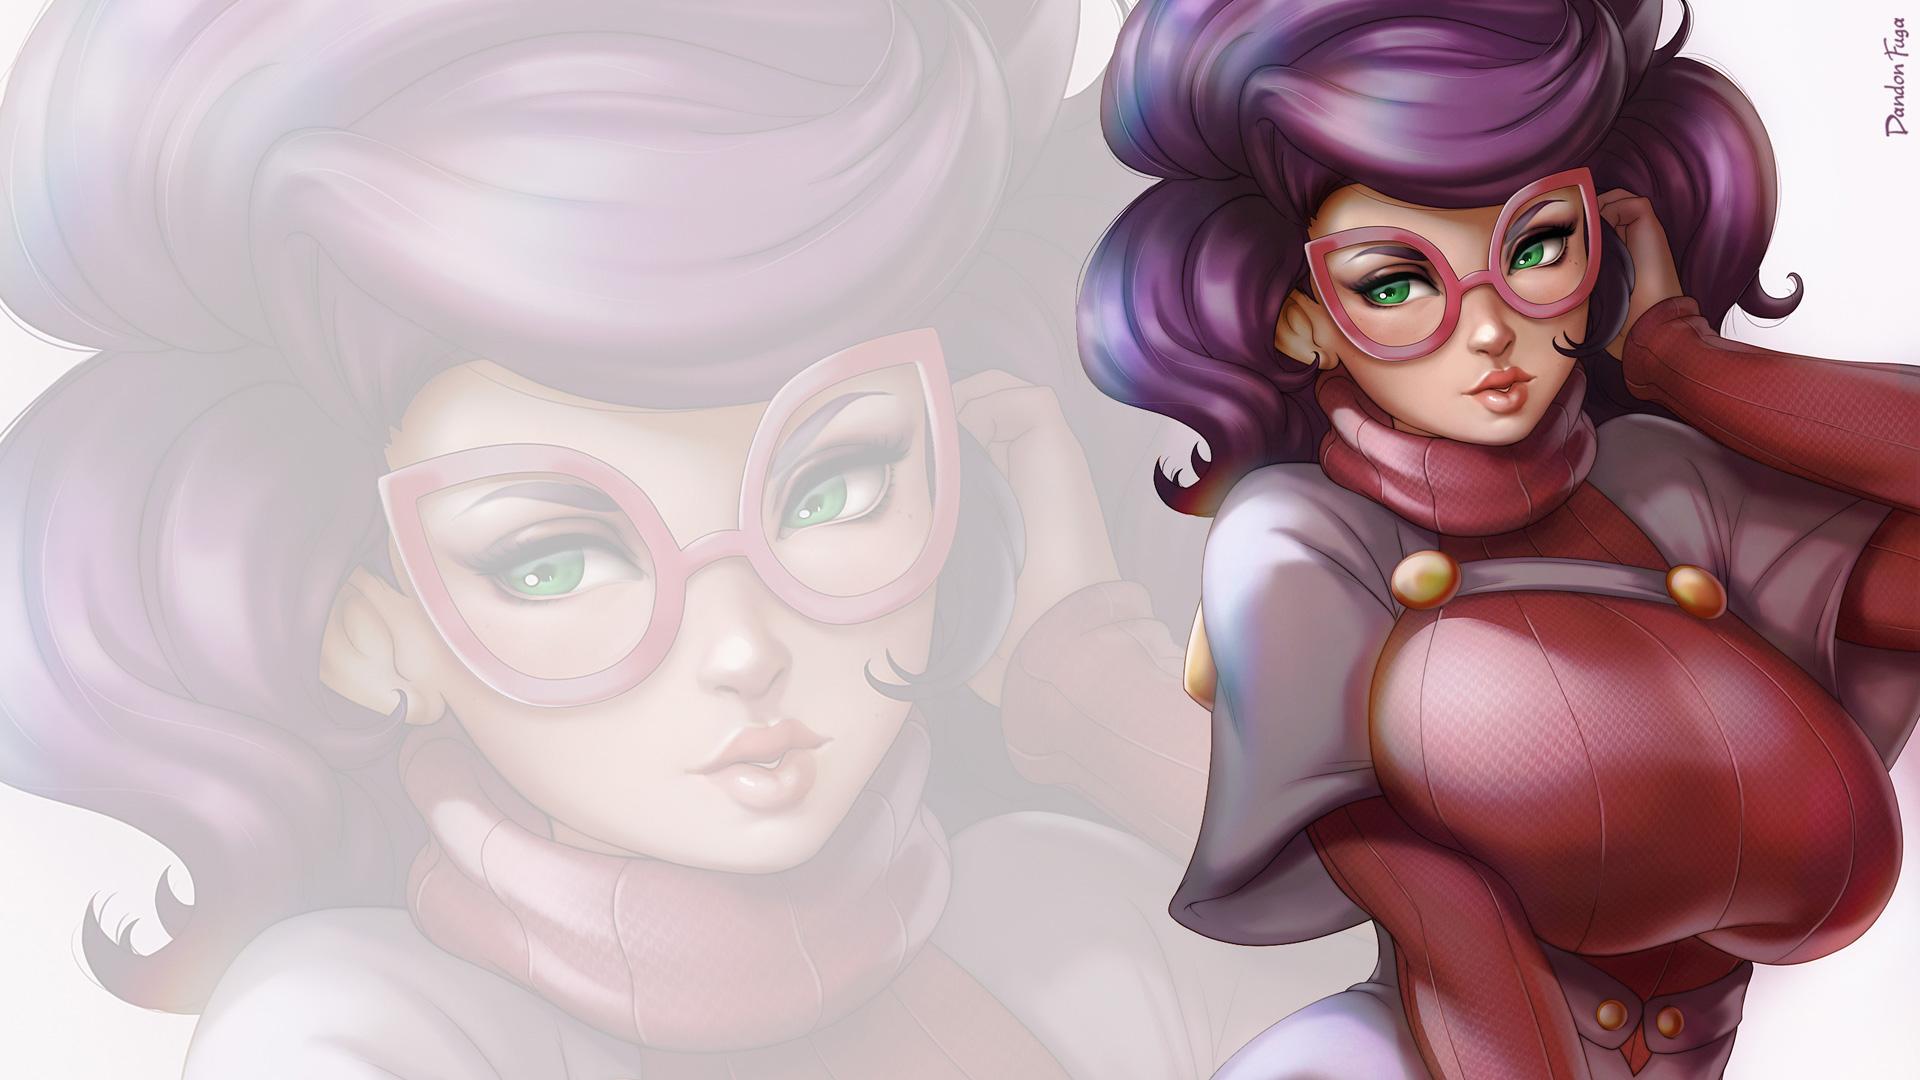 Anime 1920x1080 dandon fuga Wicke (Pokémon Sun and Moon) purple hair glasses